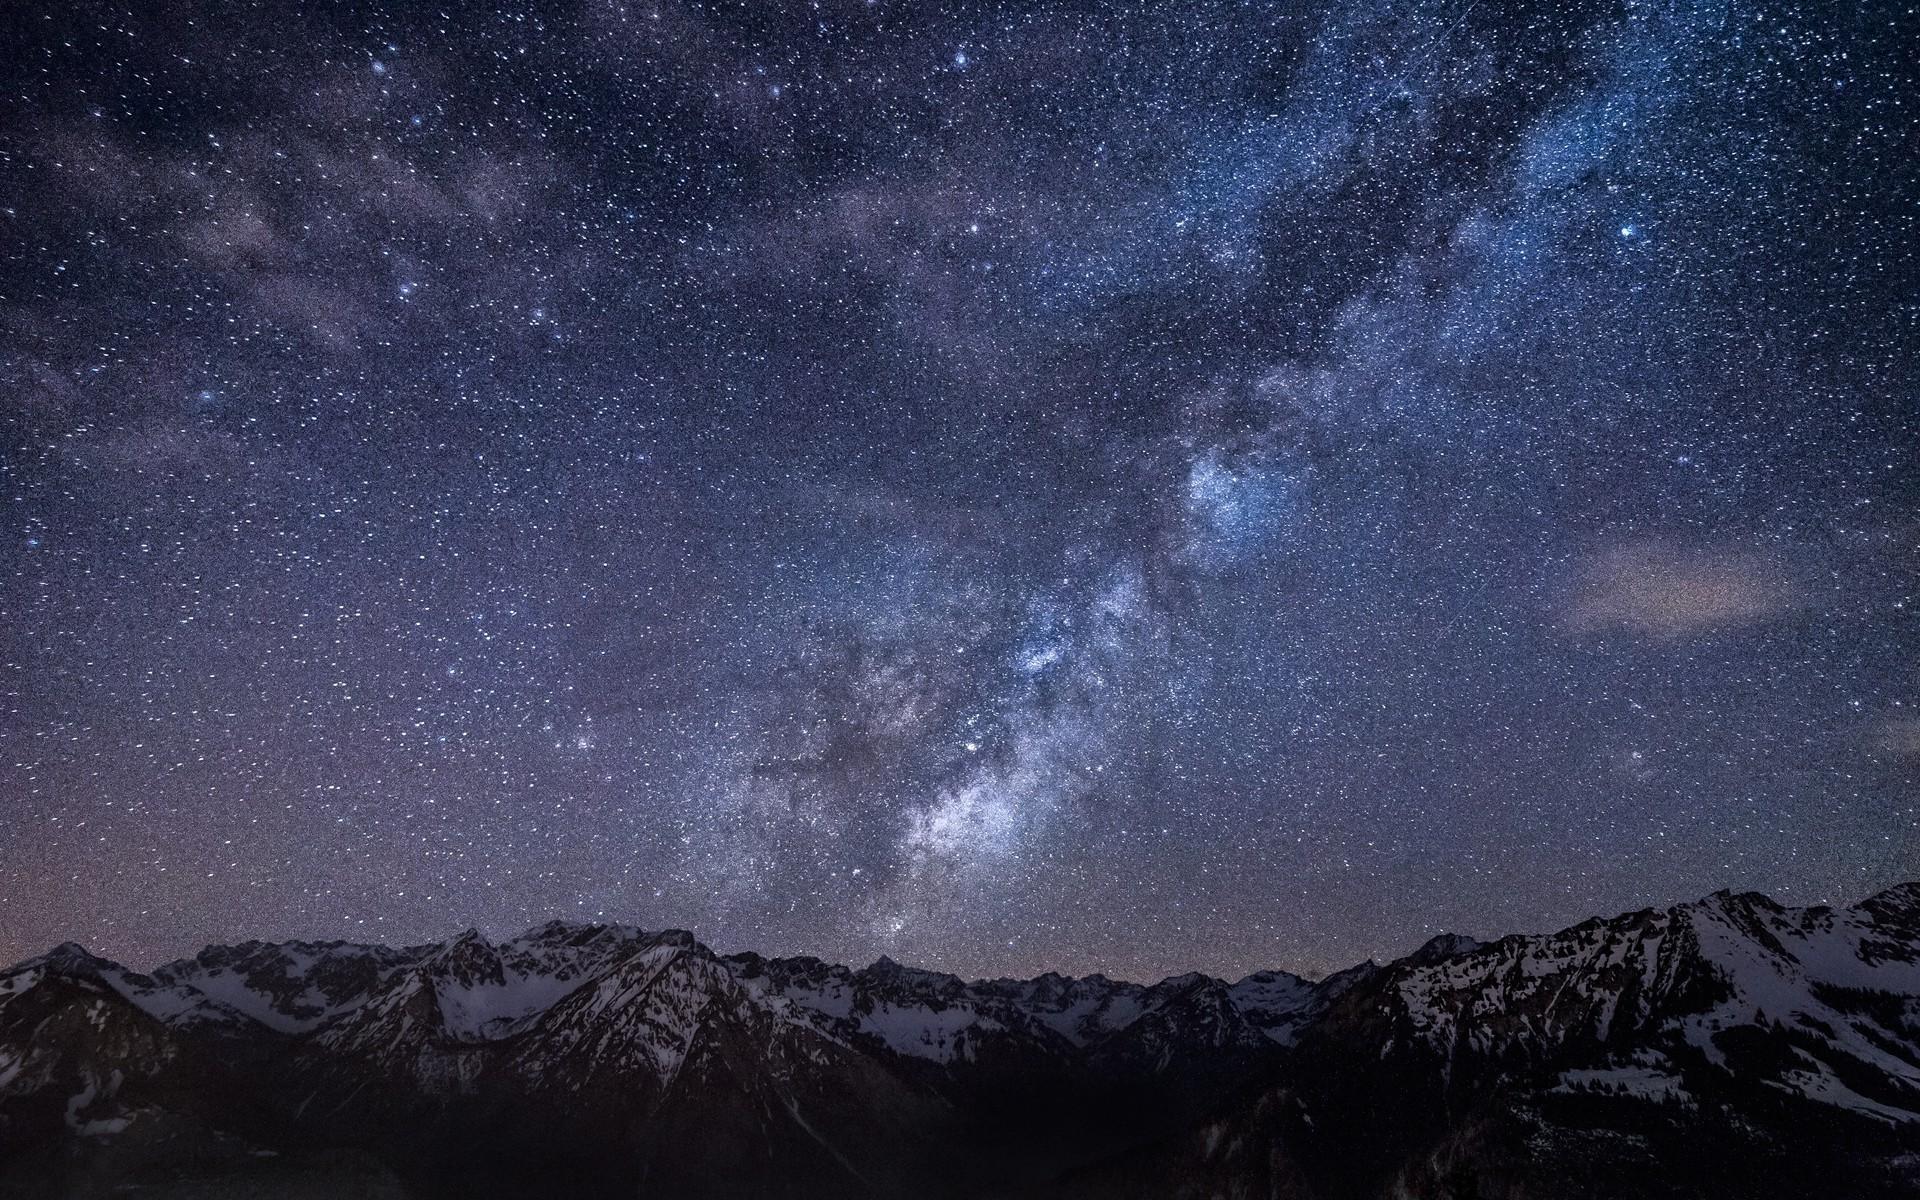 Starry sky over the mountain peak Wallpaper 1920x1200